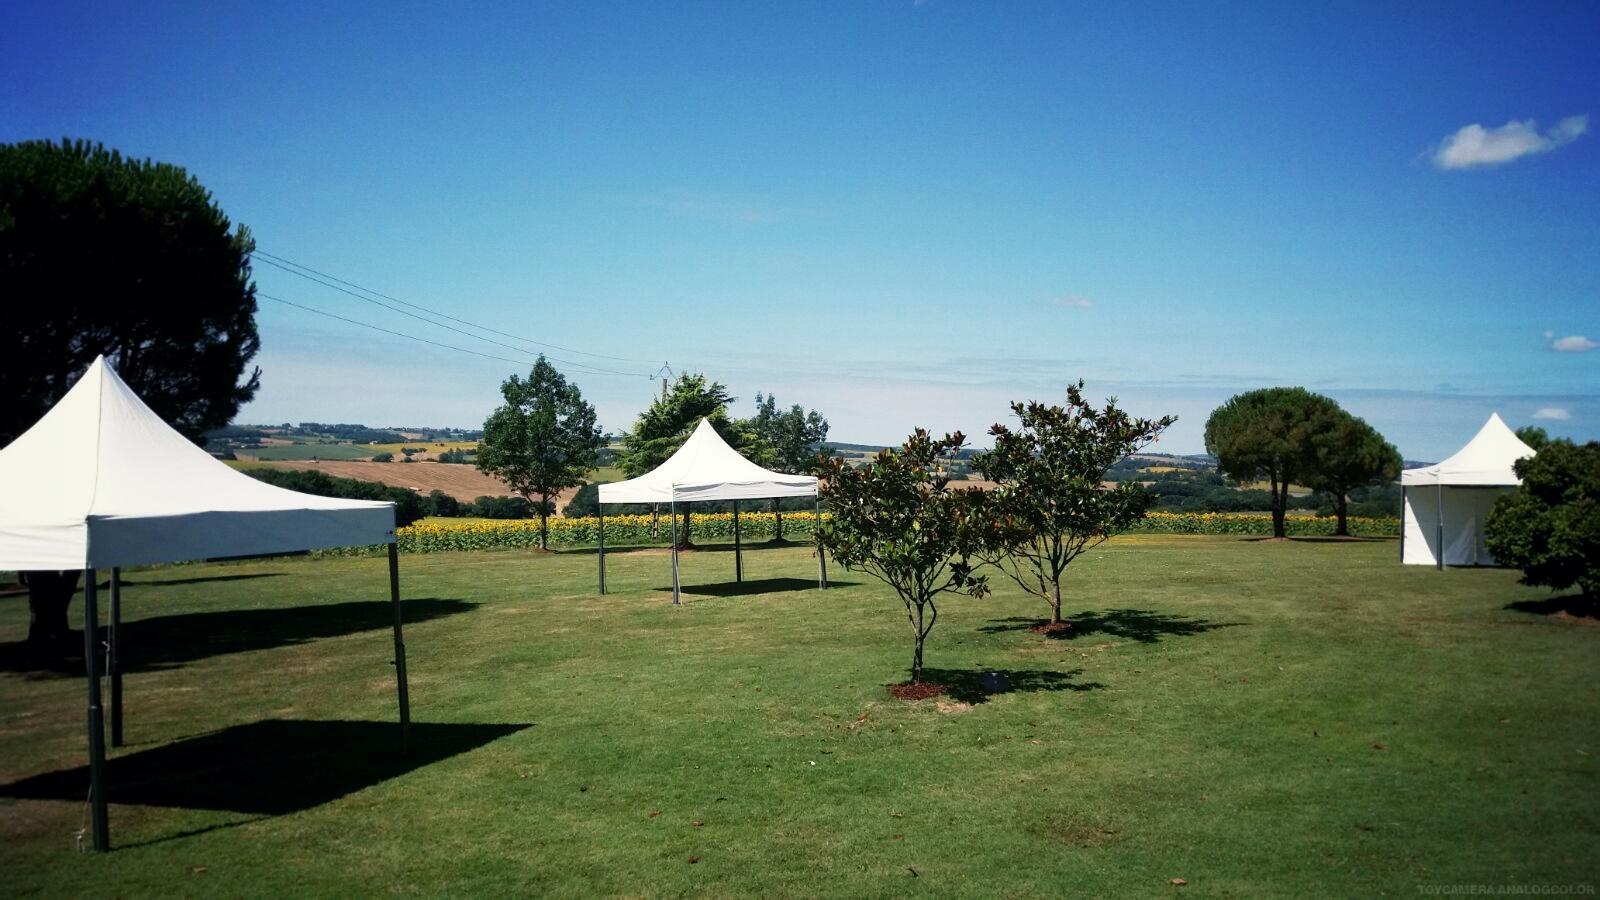 Vente pagode 4x4 structura location de mat riels de for Vente en location